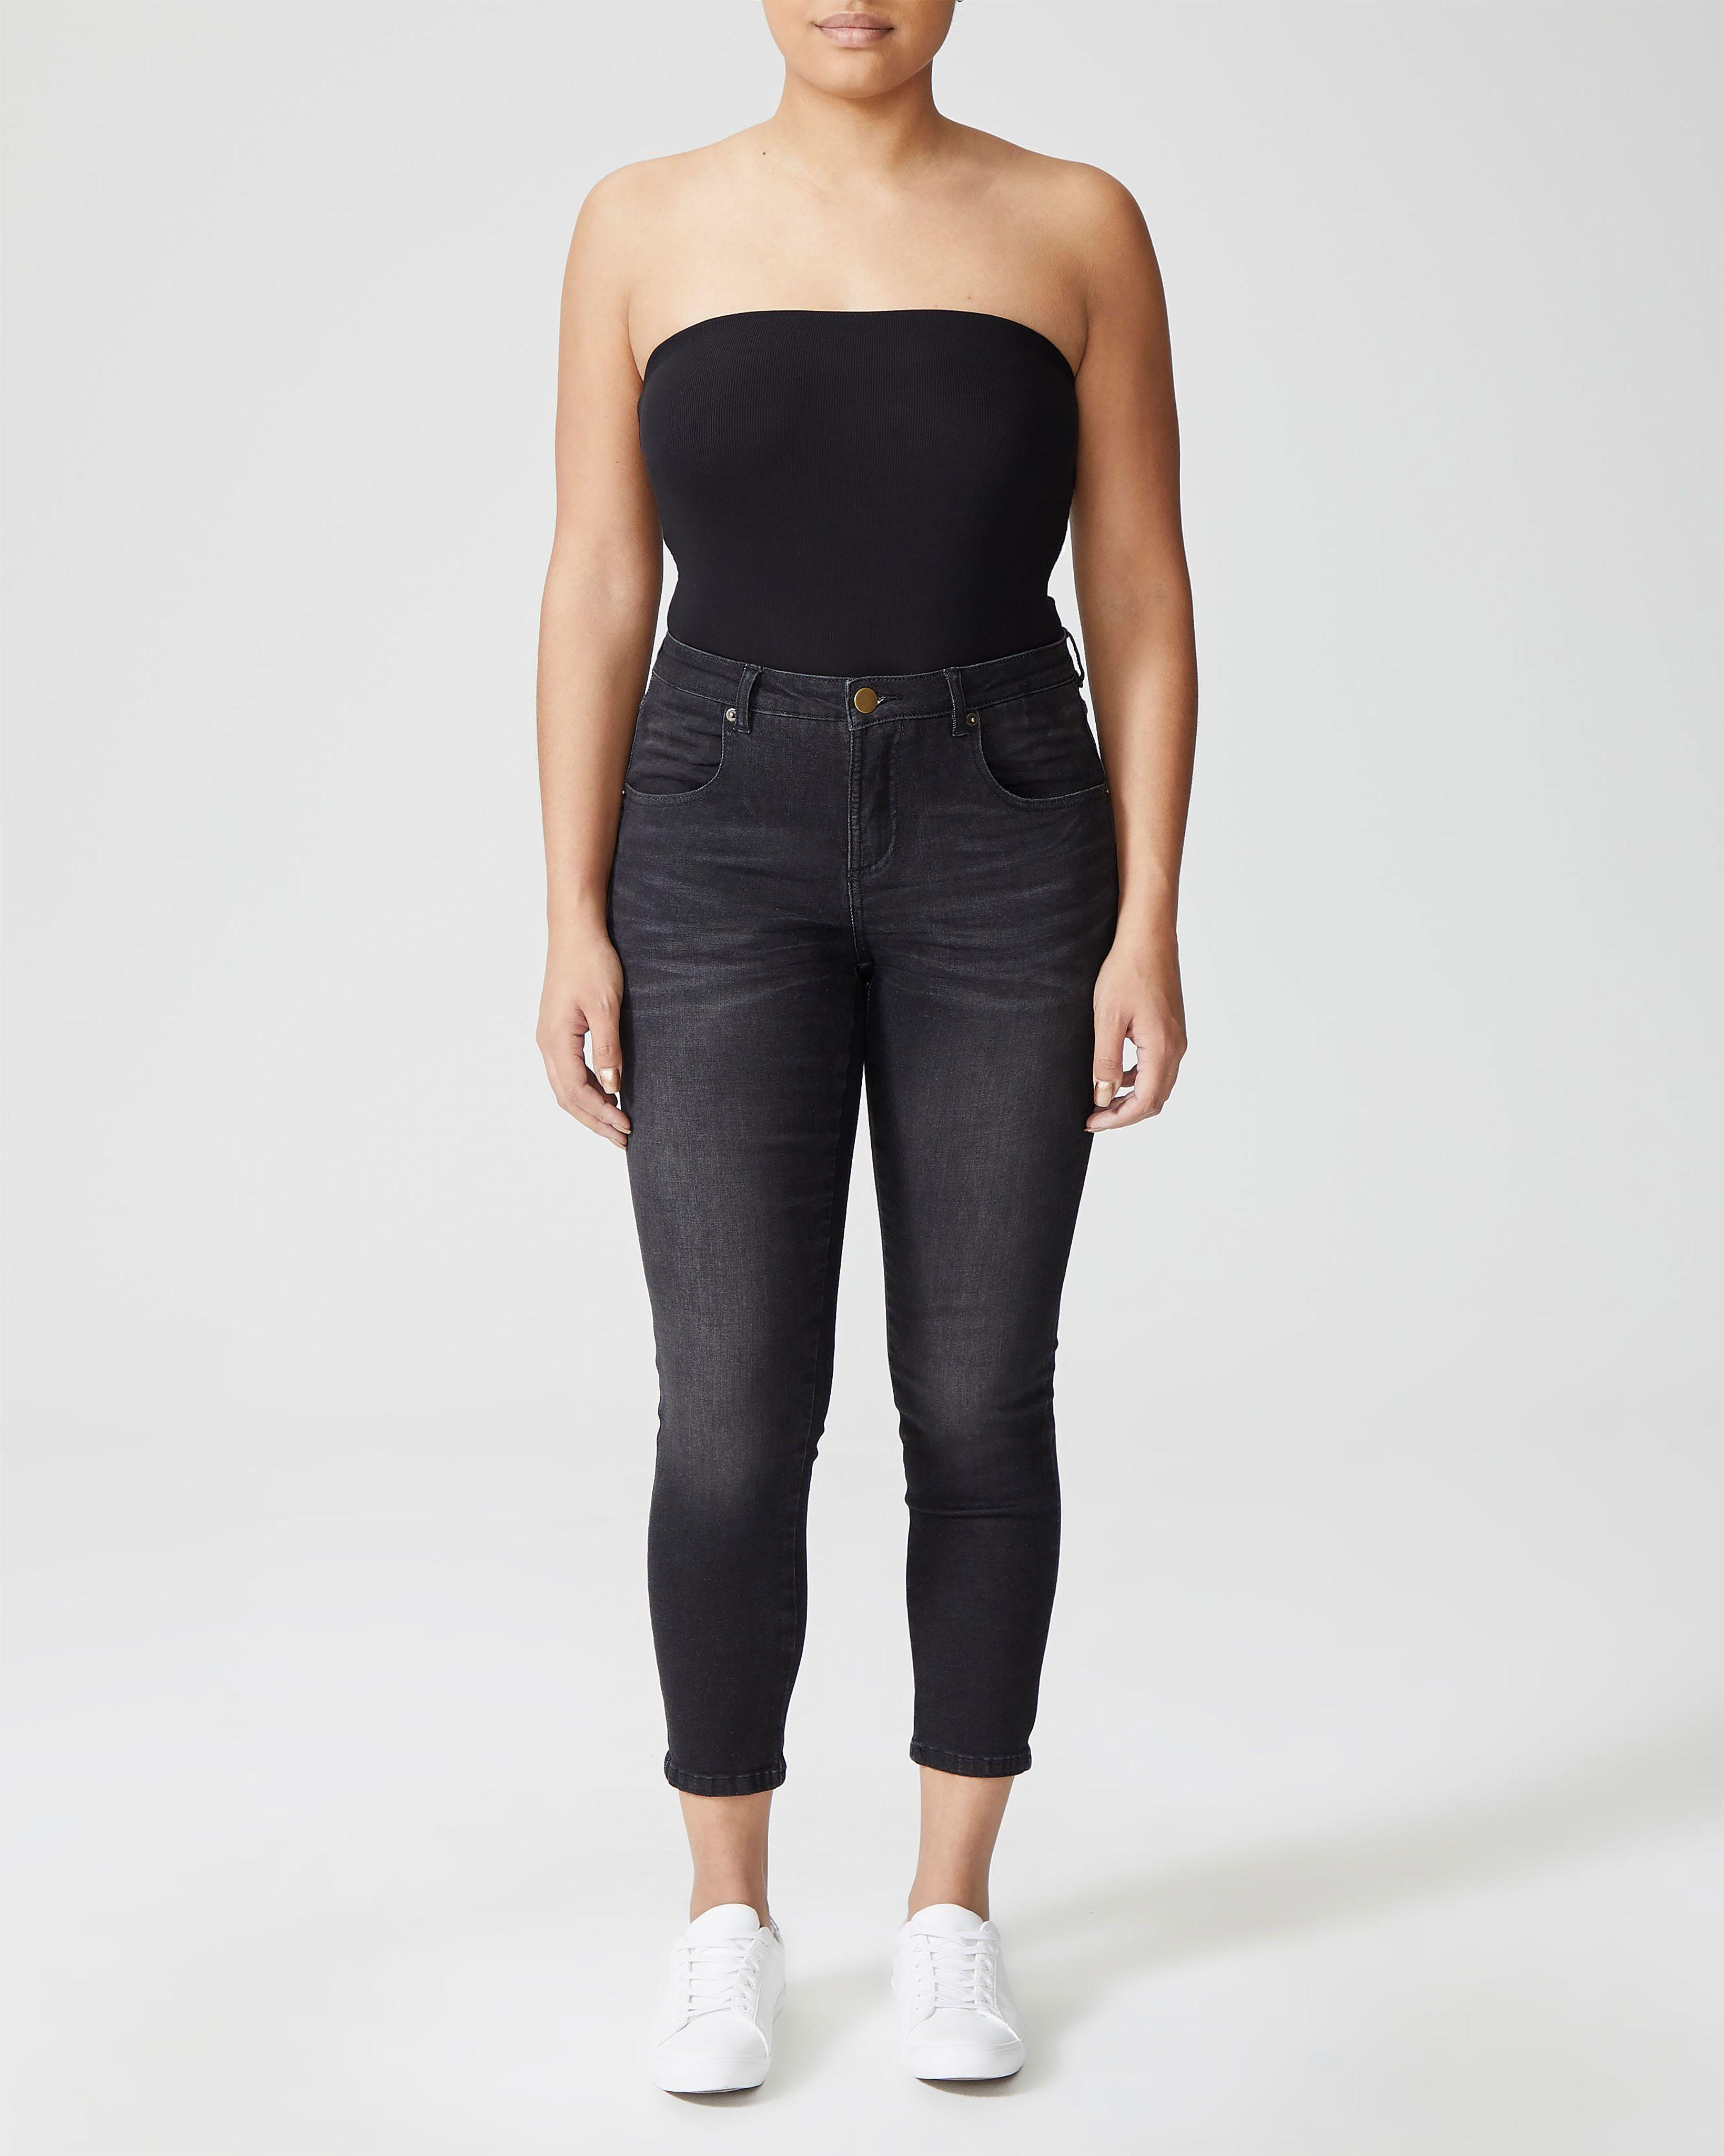 Seine Mid Rise Skinny Jeans 27 Inch - Distressed Black